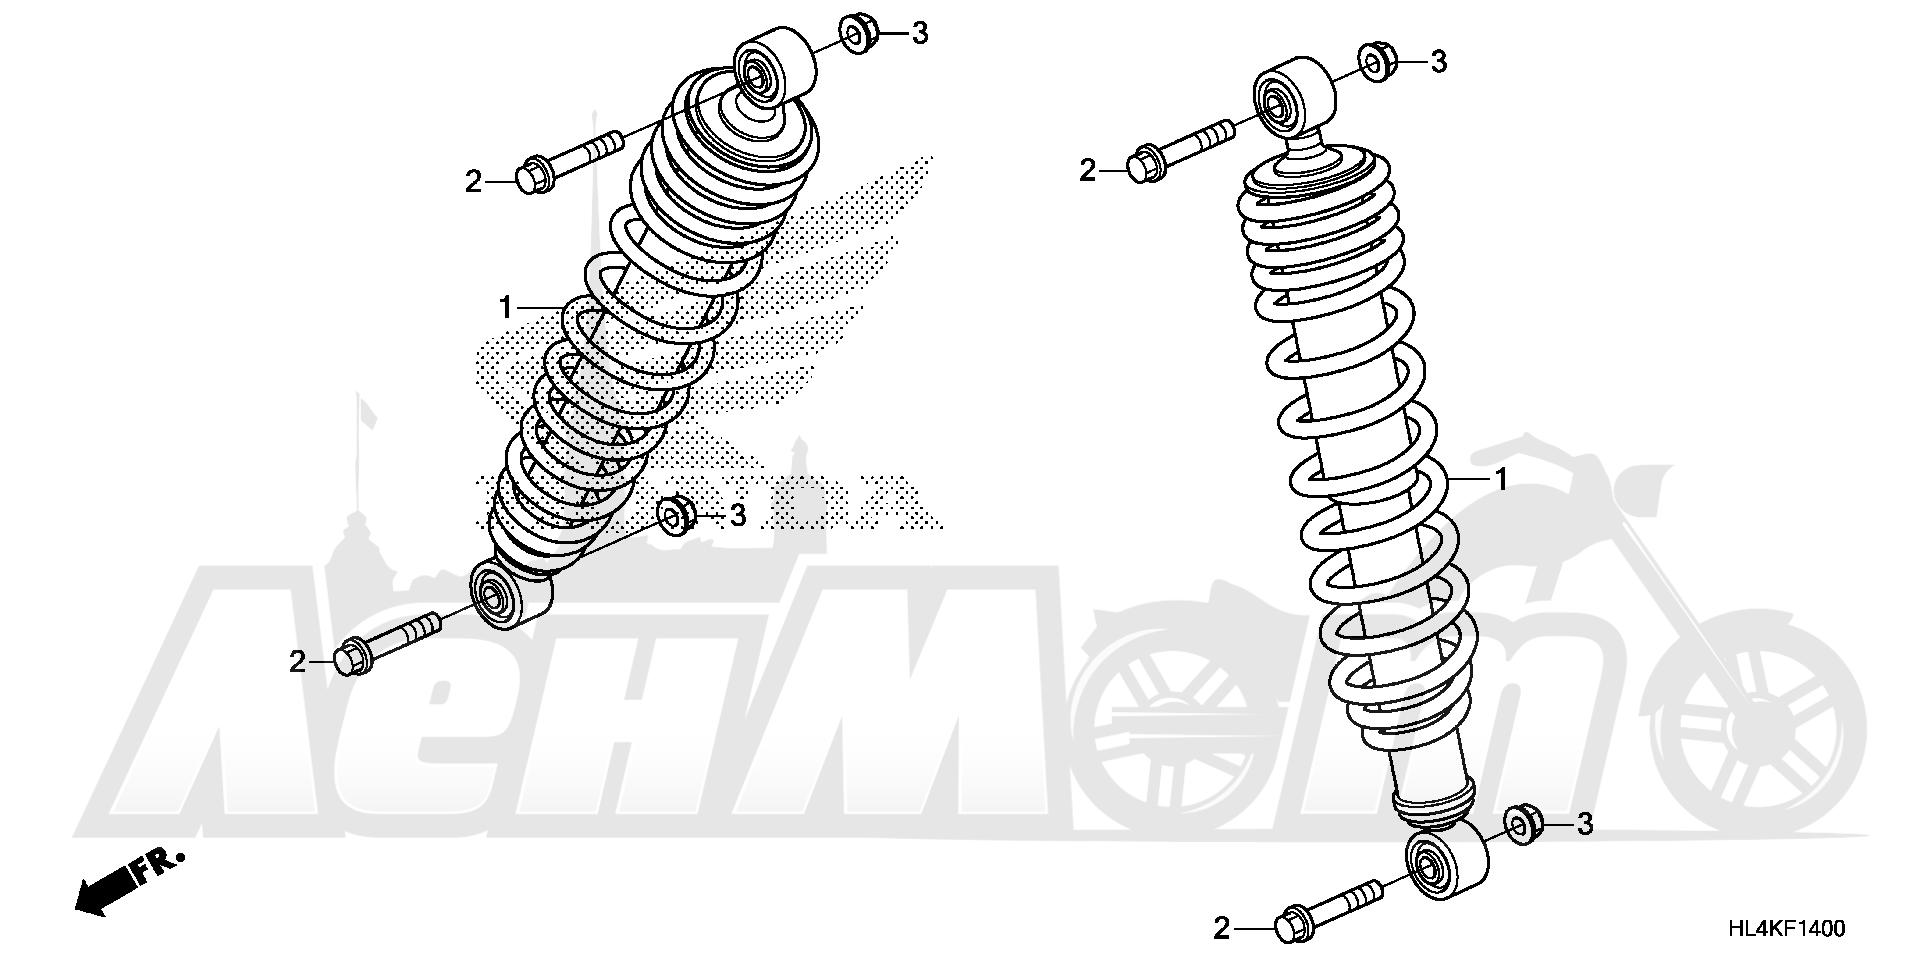 Запчасти для Квадроцикла Honda 2019 SXS1000M5D Раздел: FRONT CUSHION (1) | перед подкладка (1)